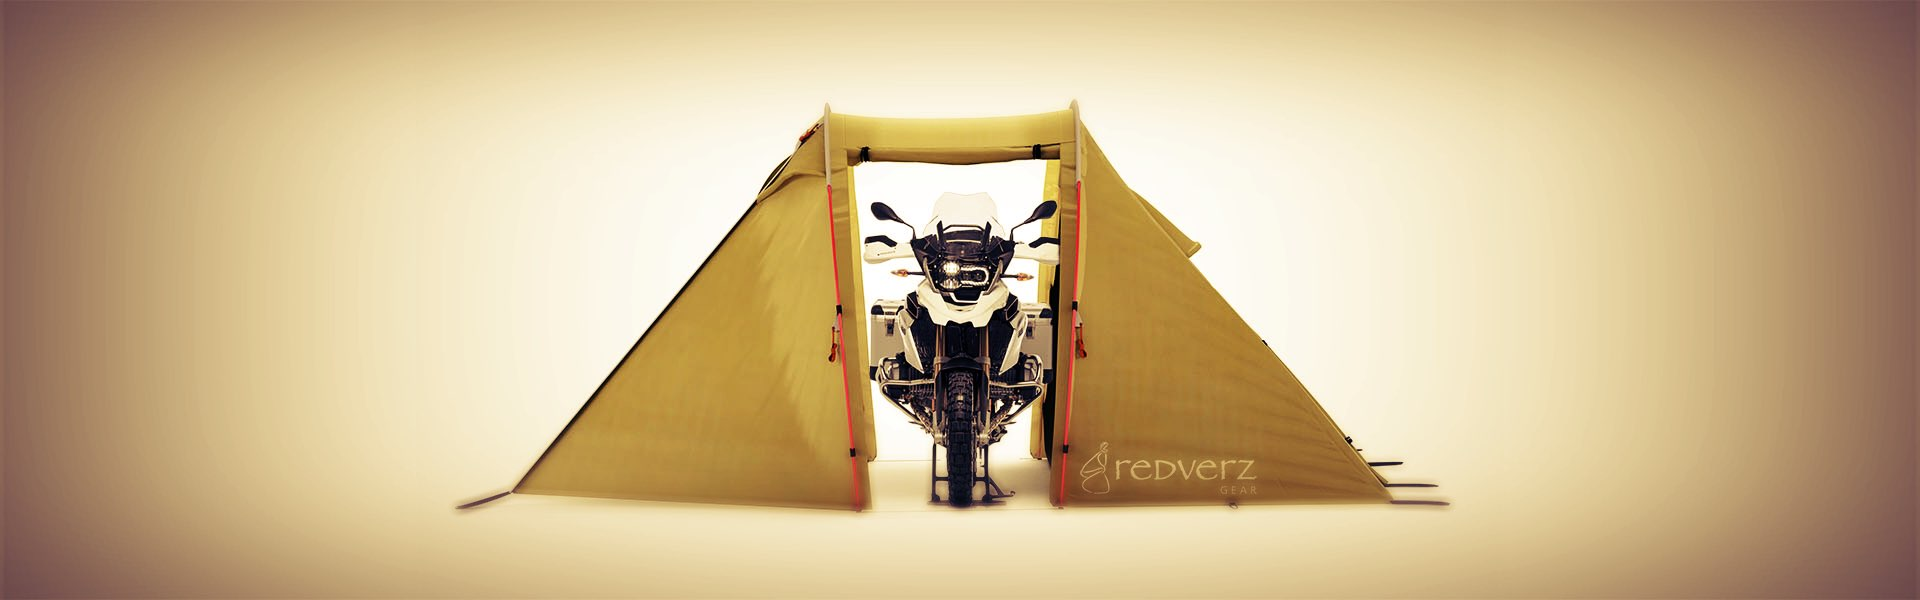 Redverz Gear's Original Mototent, Motorcycle Campingand motorcycle tents